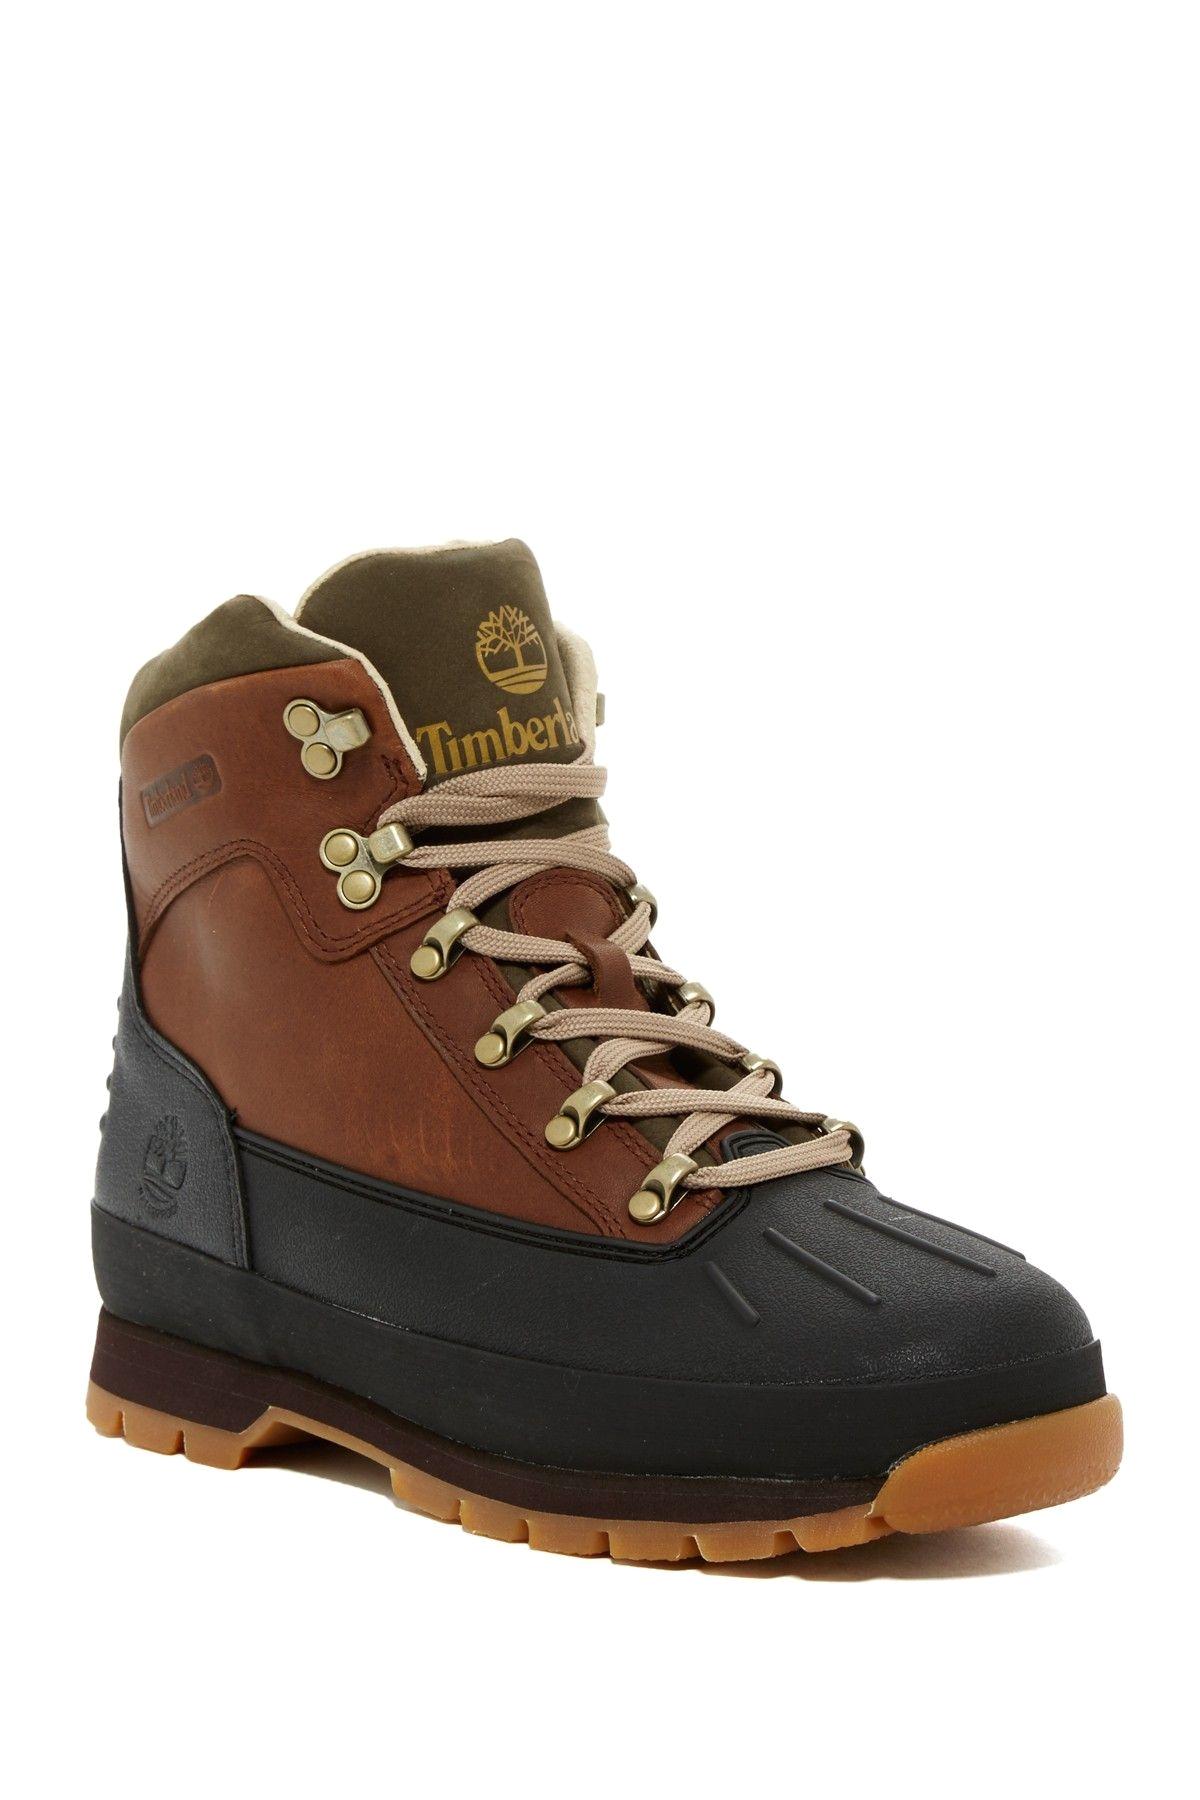 euro hiker waterproof shell toe boot